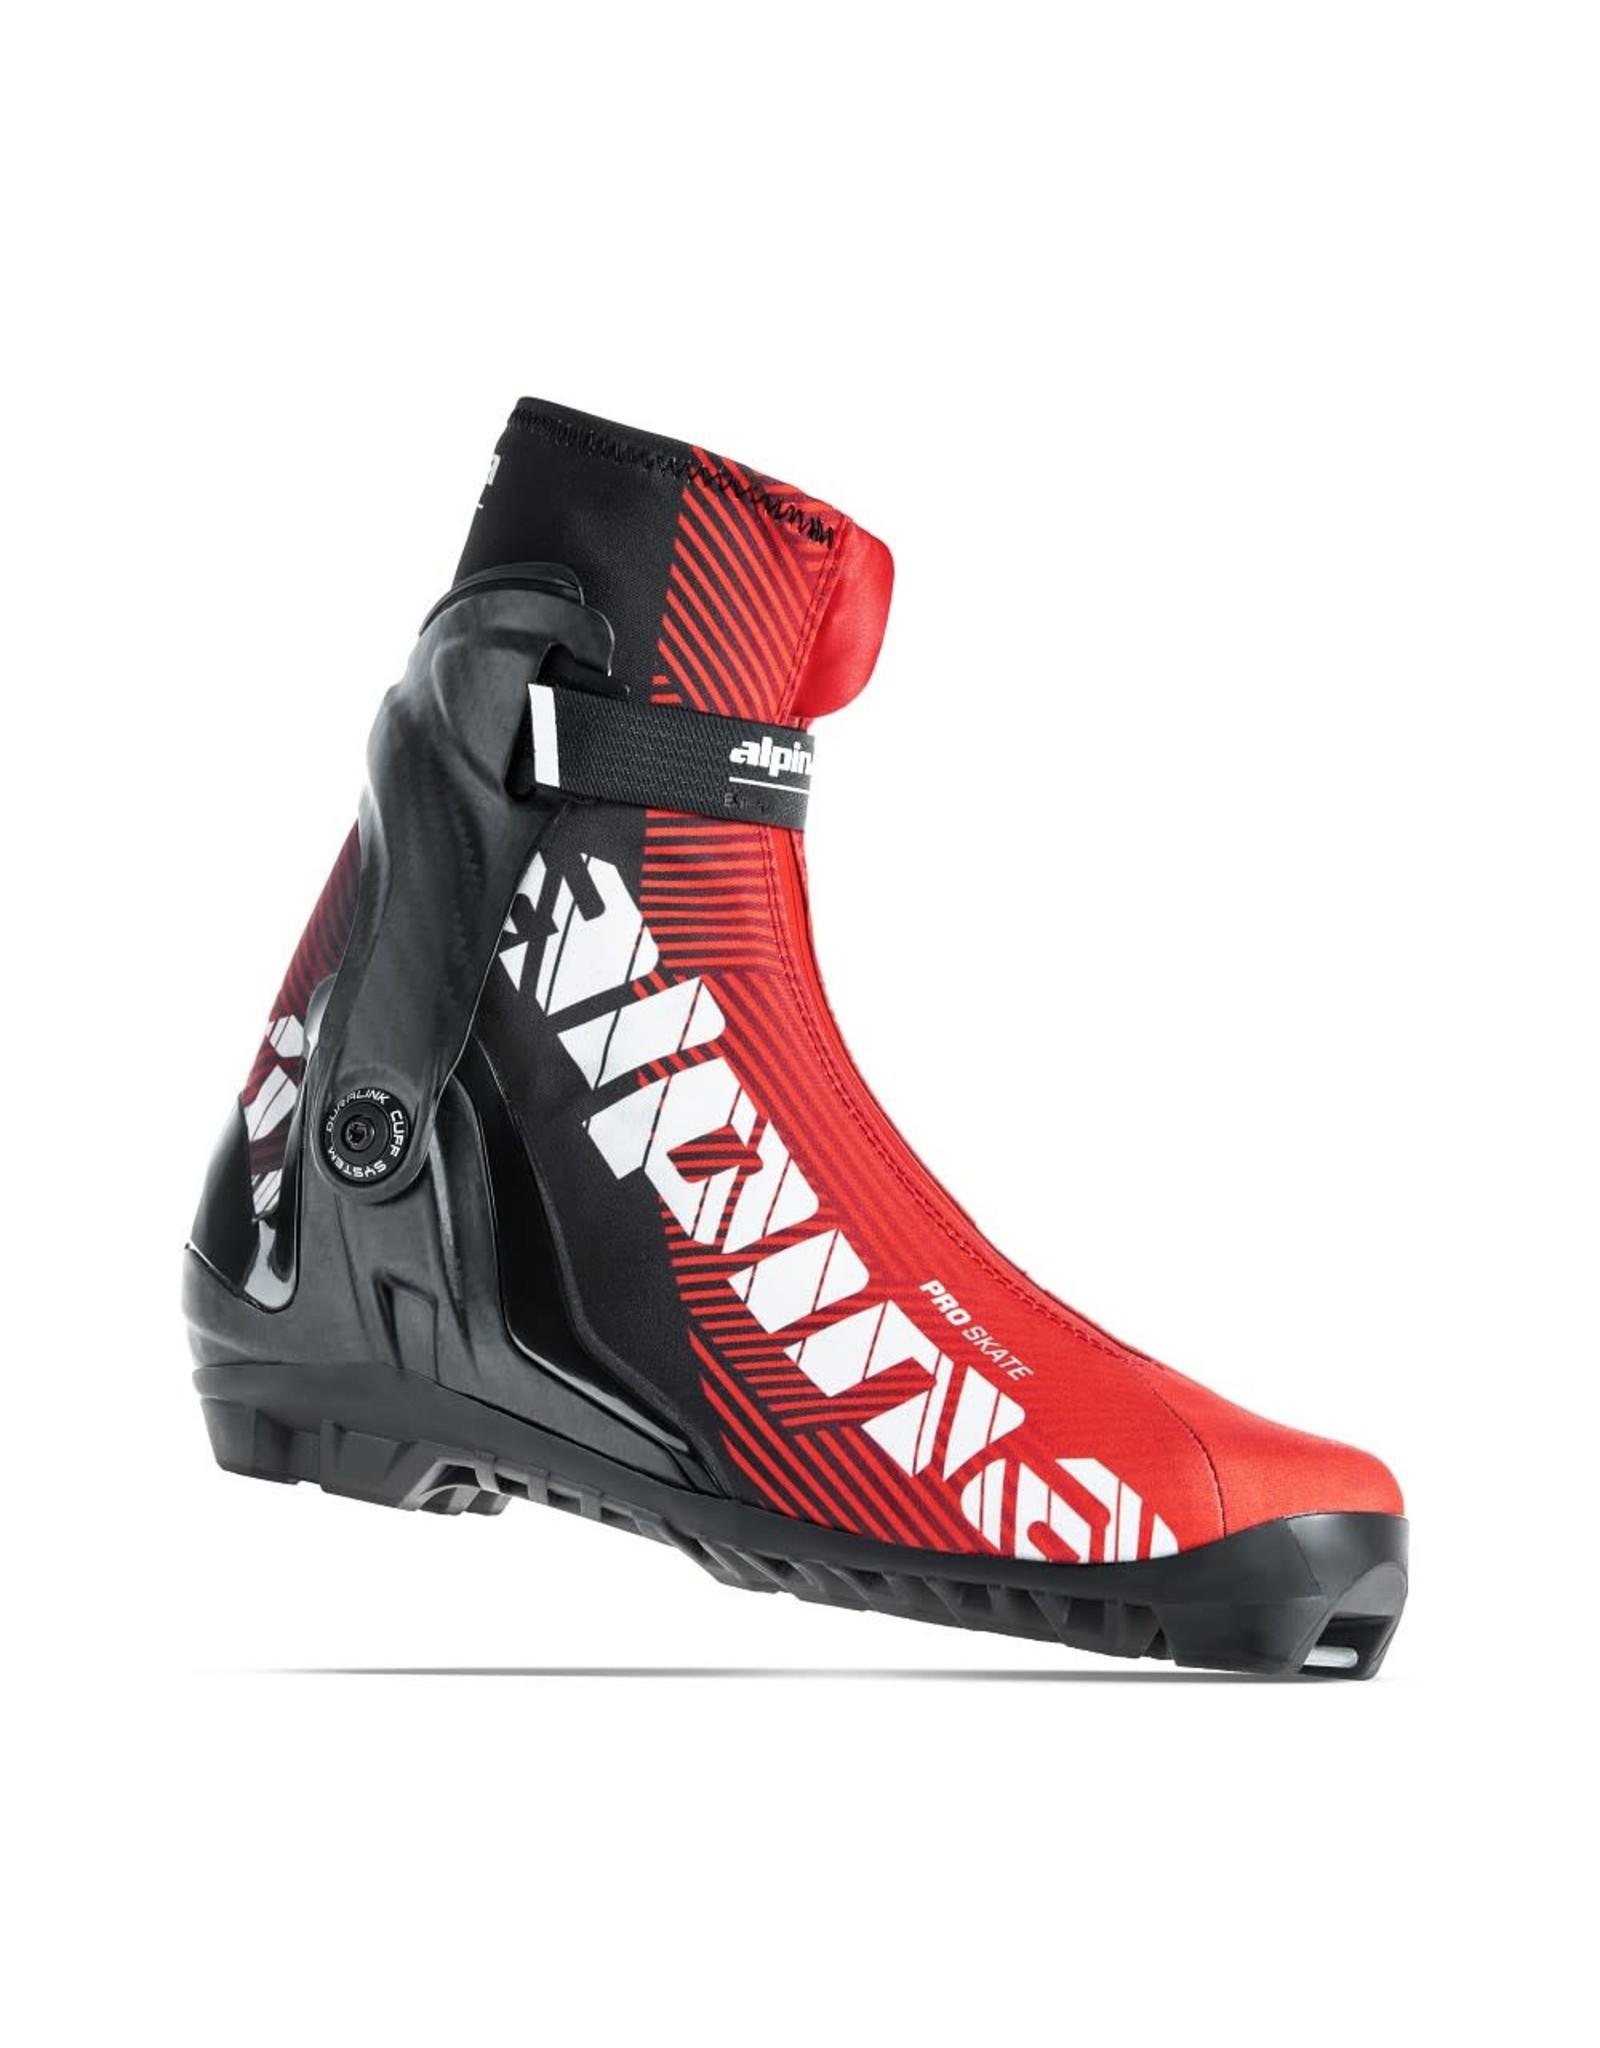 Alpina Alpina Pro Skate Boot